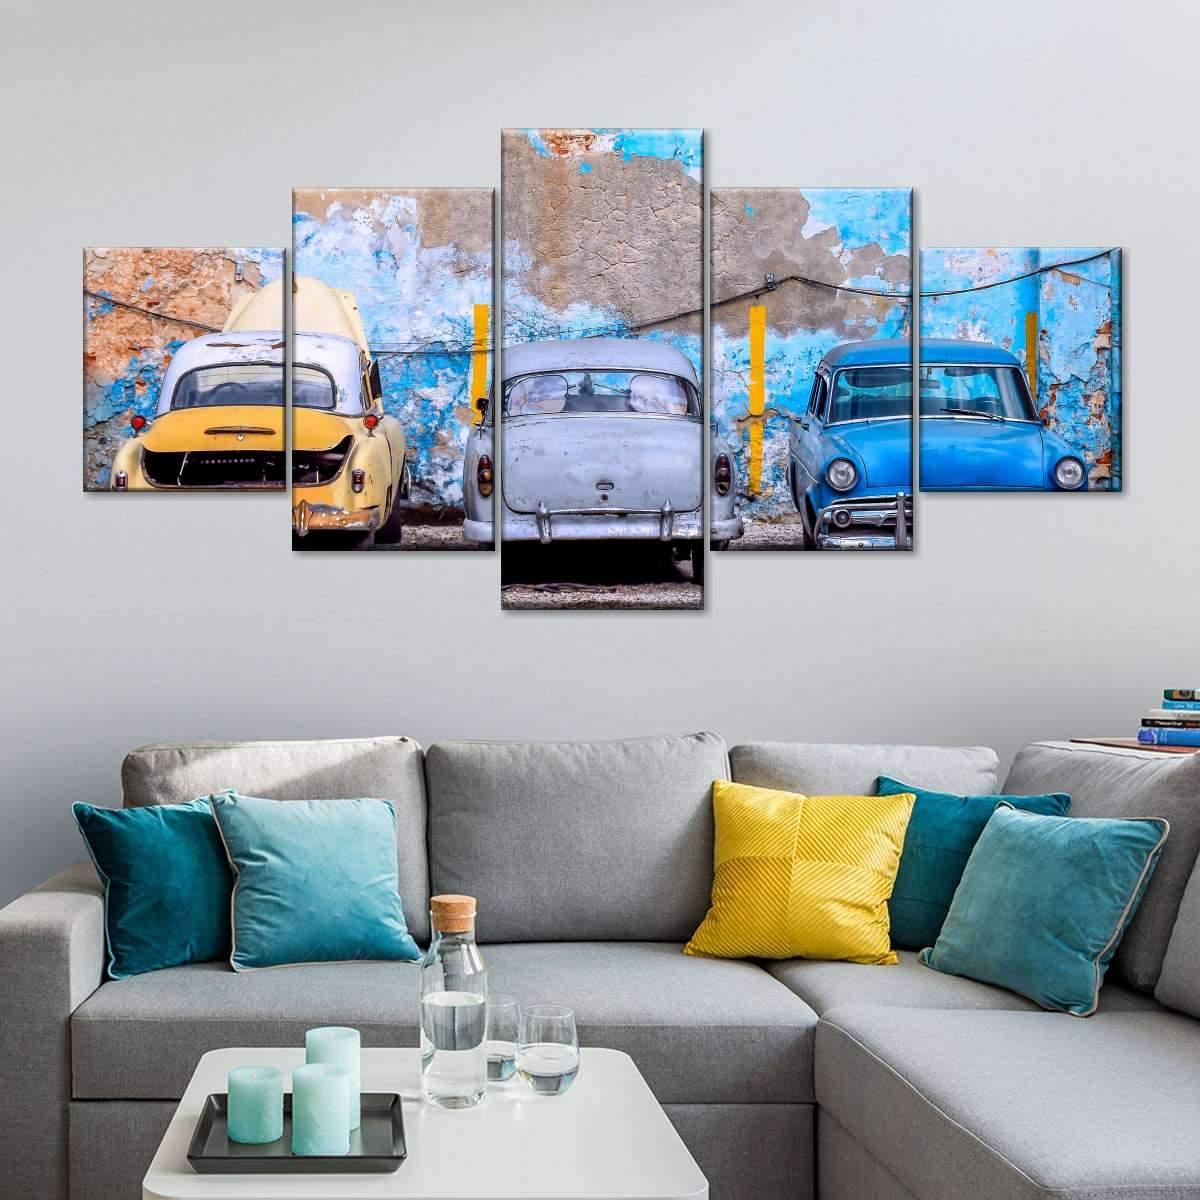 Rustic Cars In Trinidad Multi Panel Canvas Wall Art